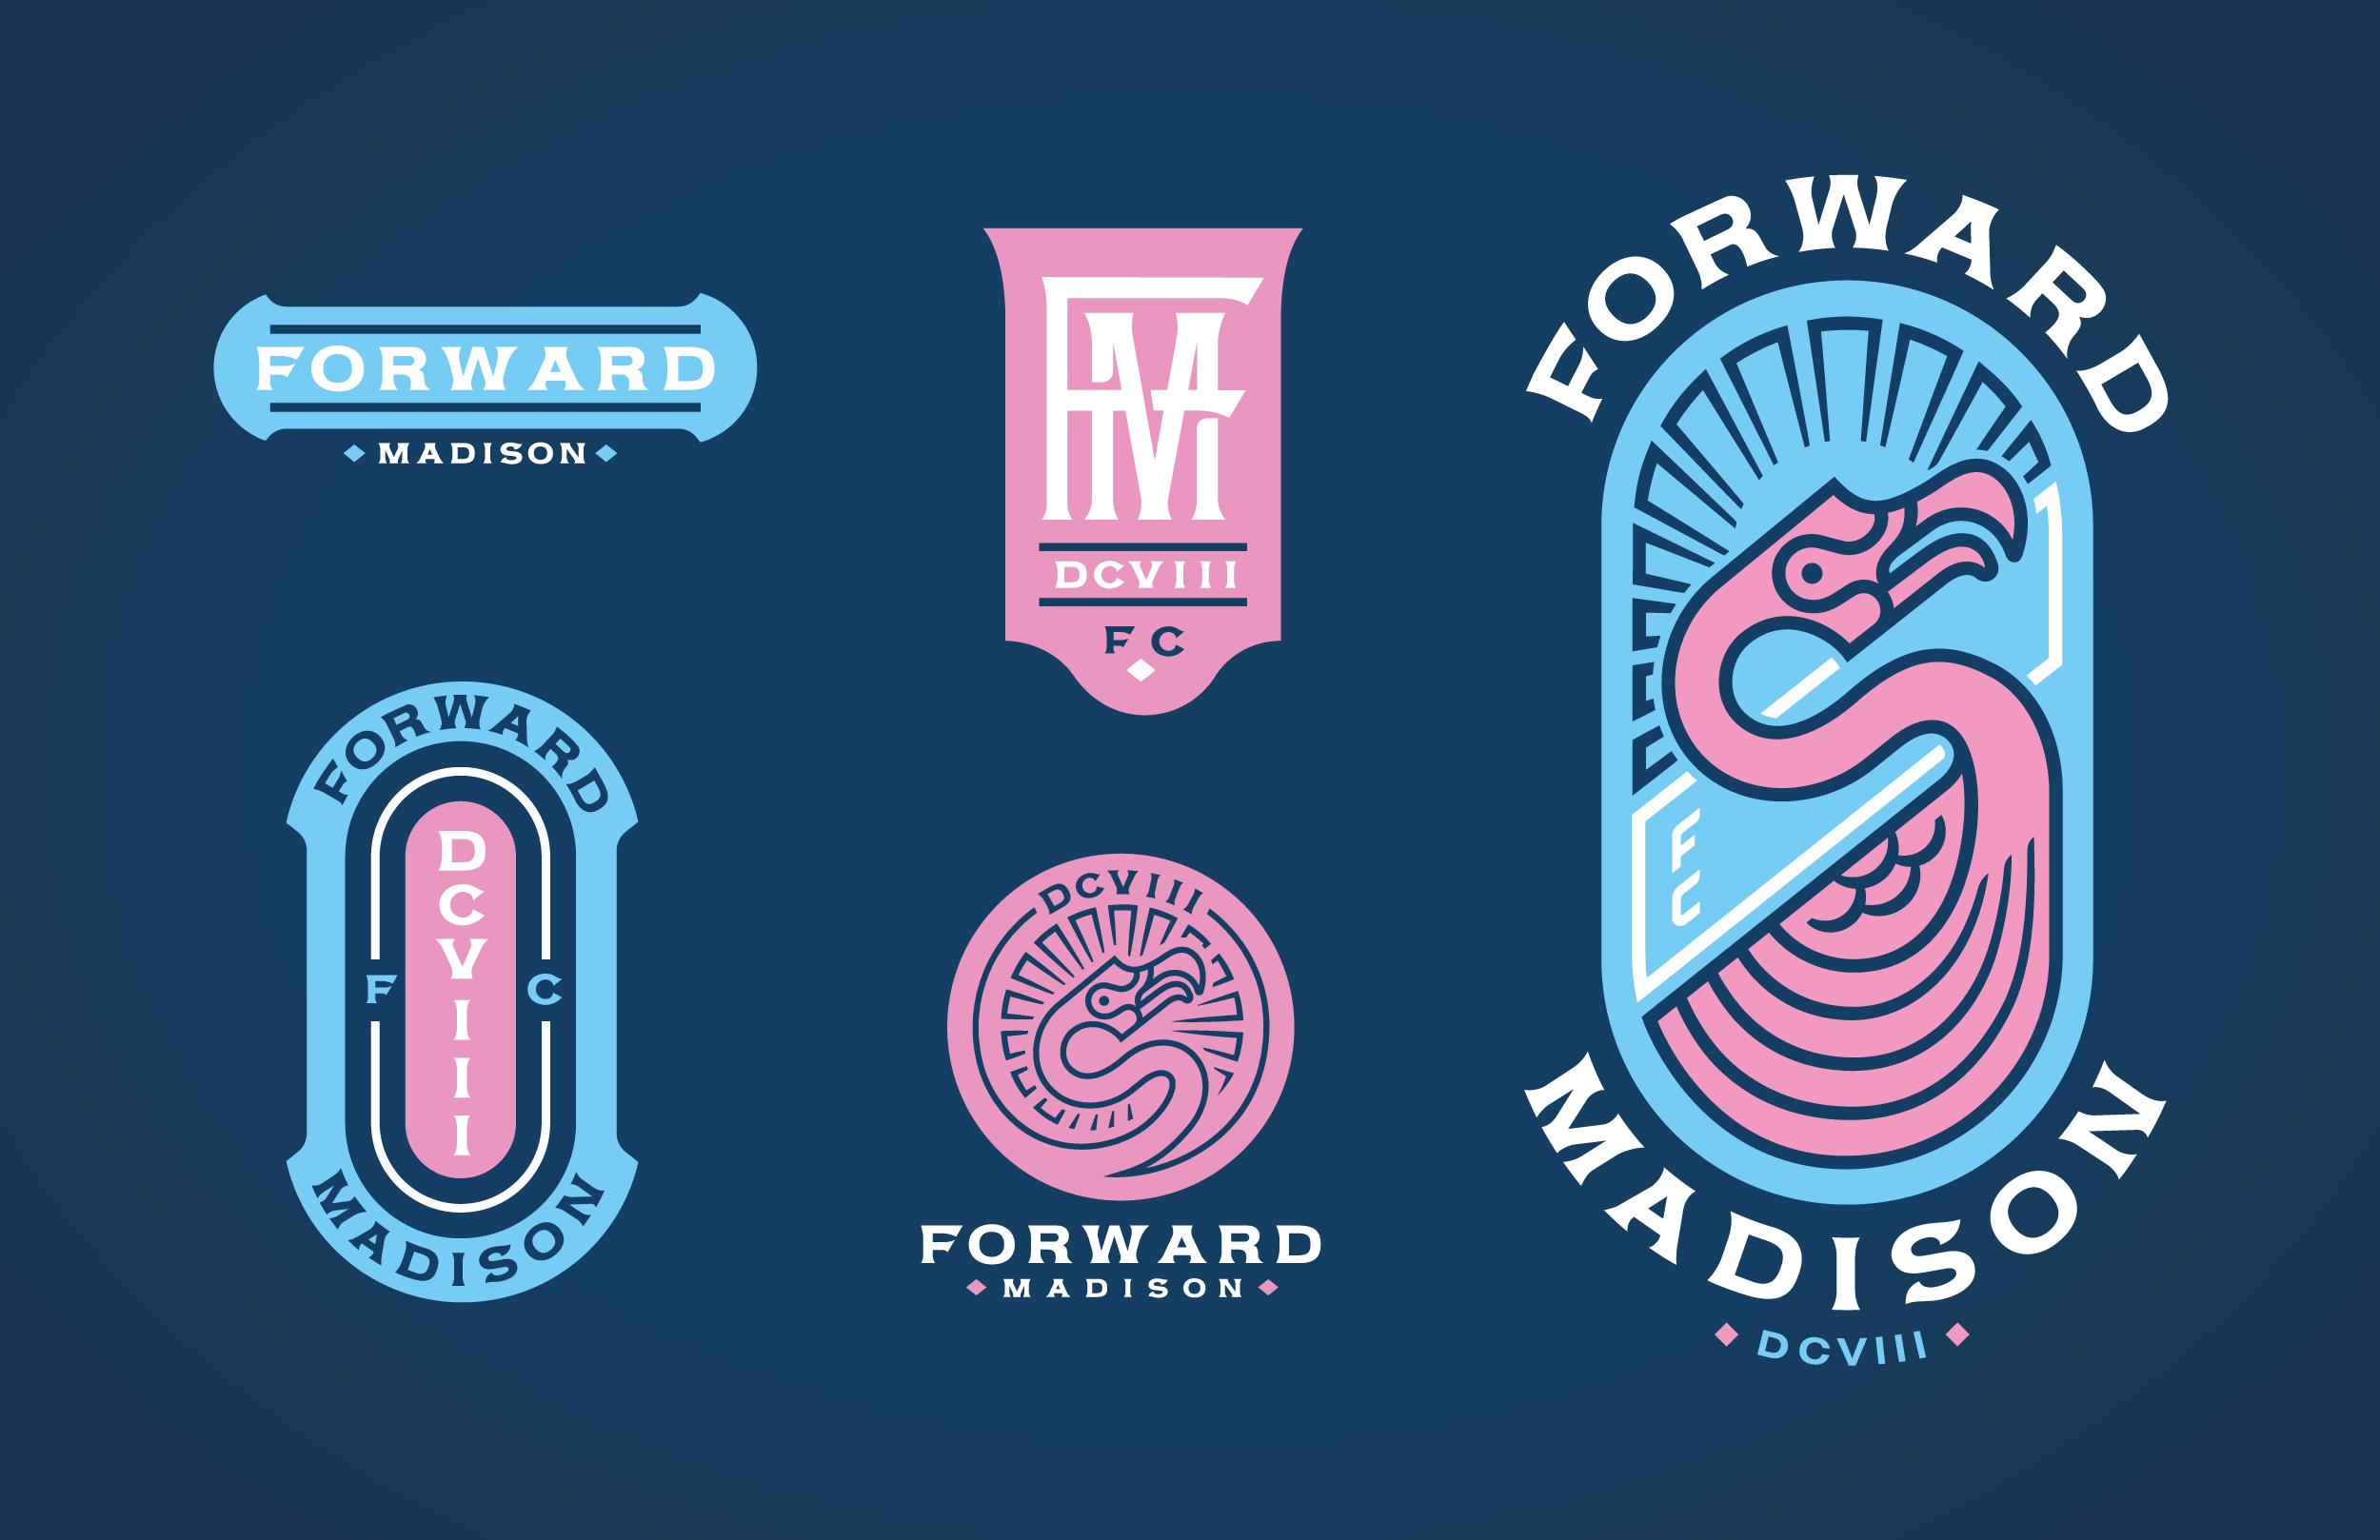 Foward_Madison_Logo_Assets_02.png